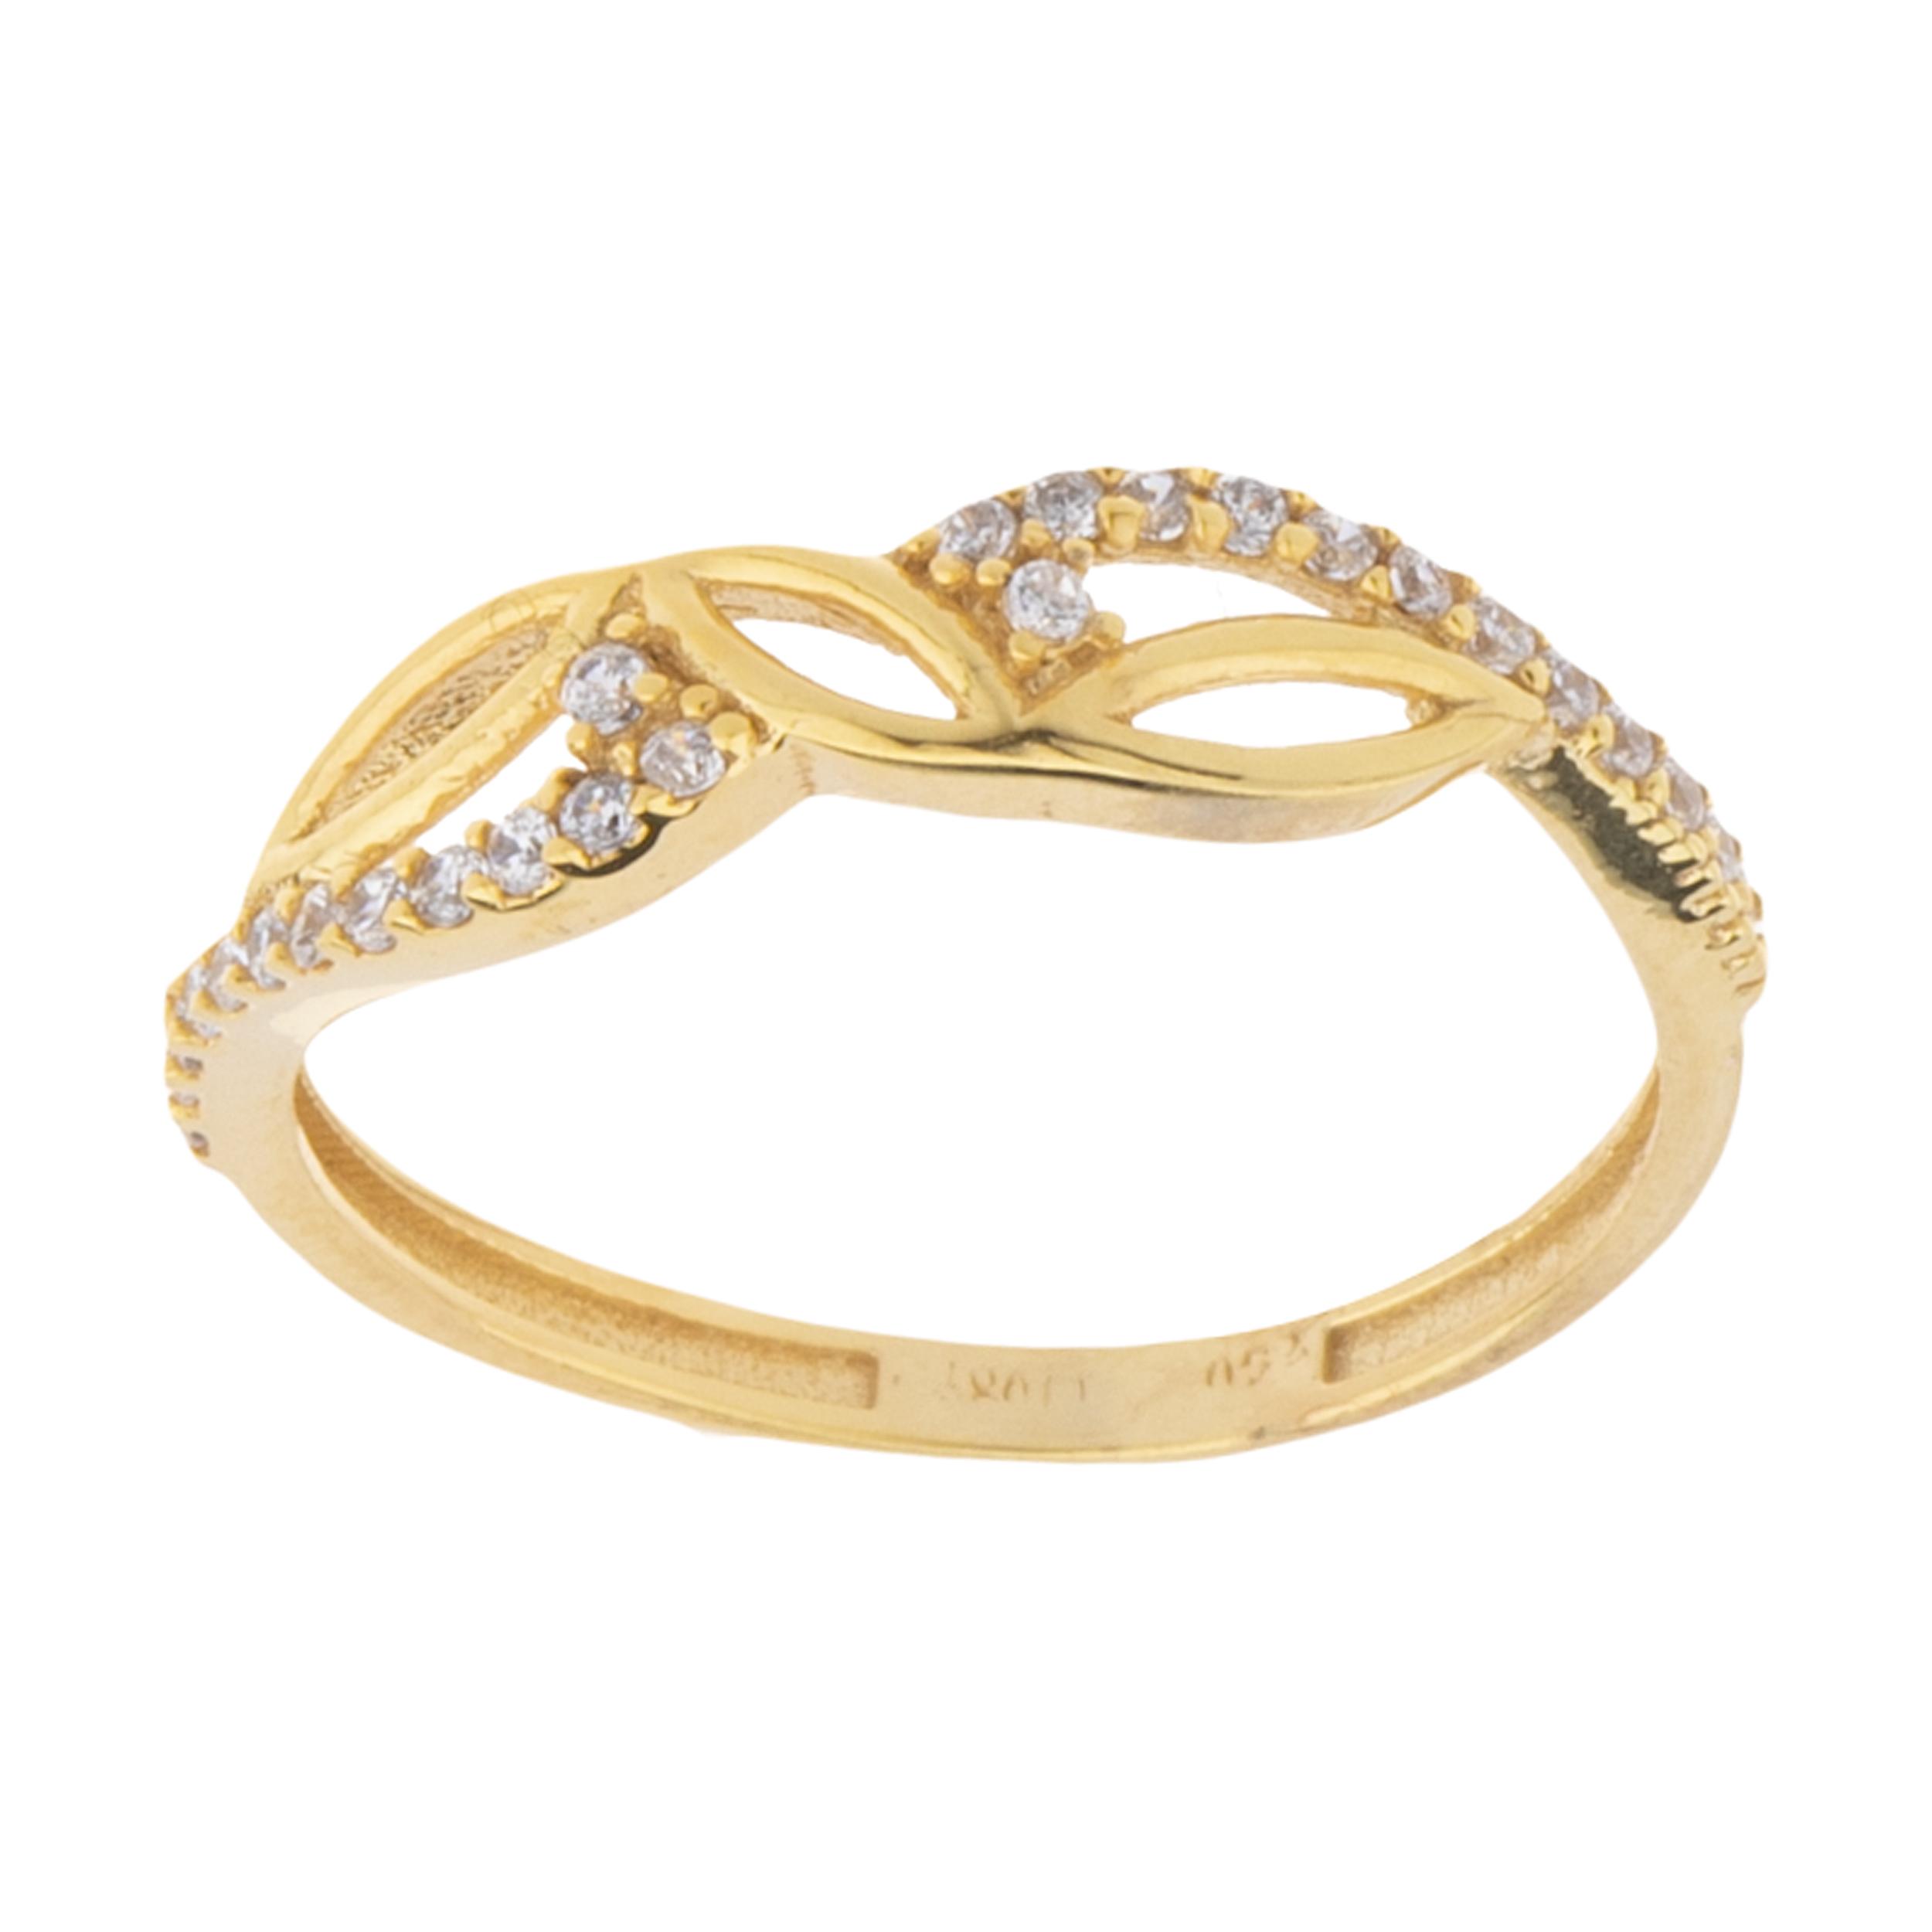 انگشتر طلا 18 عیار زنانه کانیار گالری کد AT5